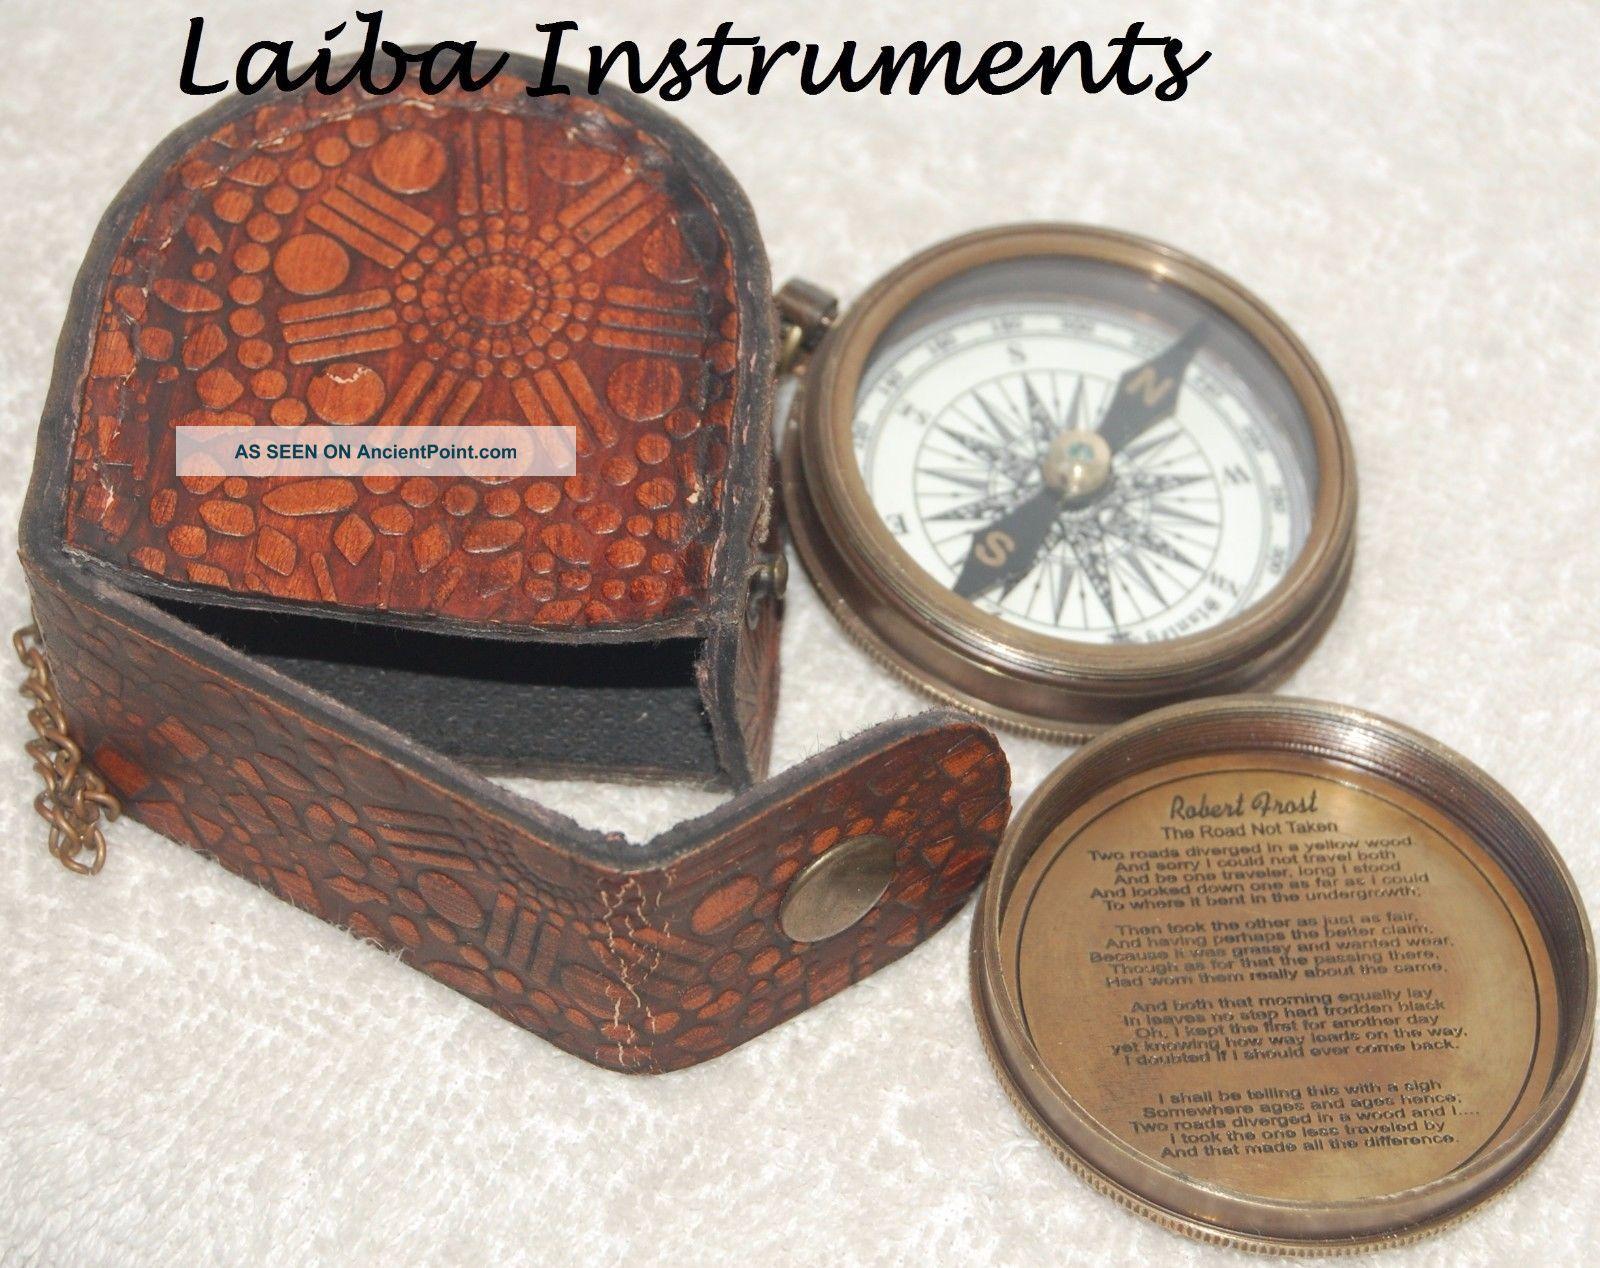 Antique Brass Compass Vintage Robert Frost Poem Compass Nautical W/leather Case@ Compasses photo